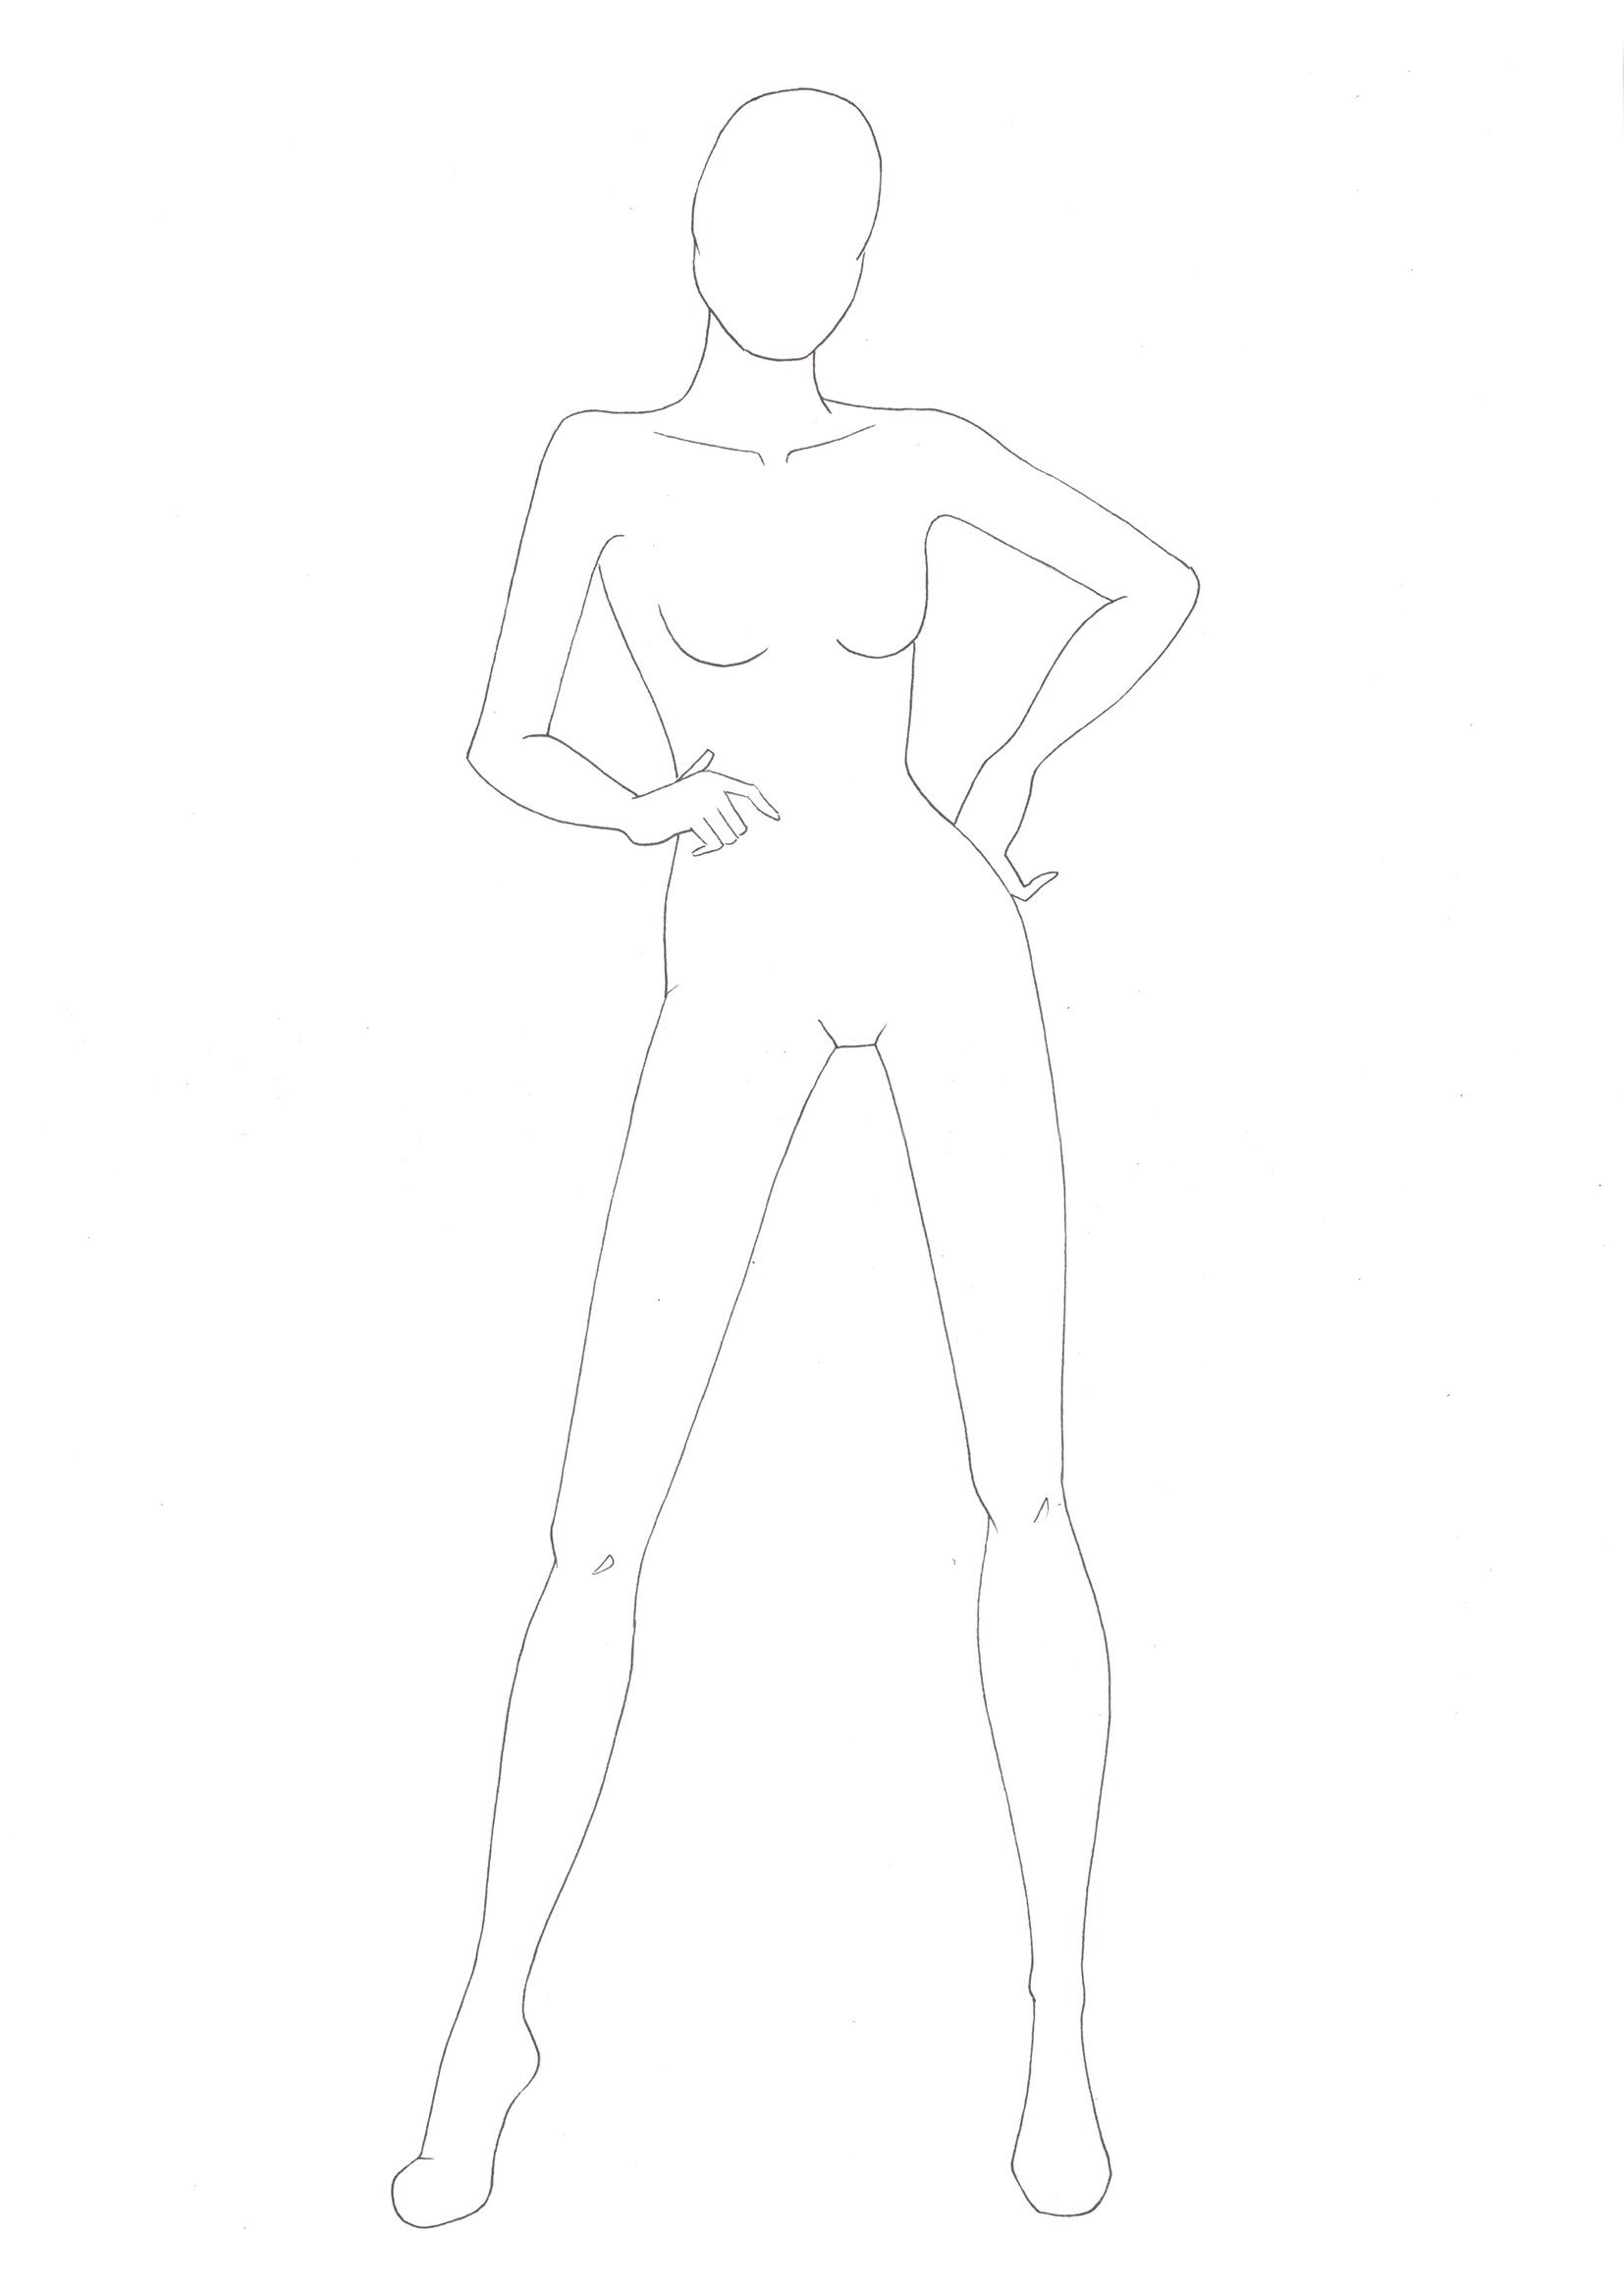 Image result for fashion model sketch outline - picsstyle.com